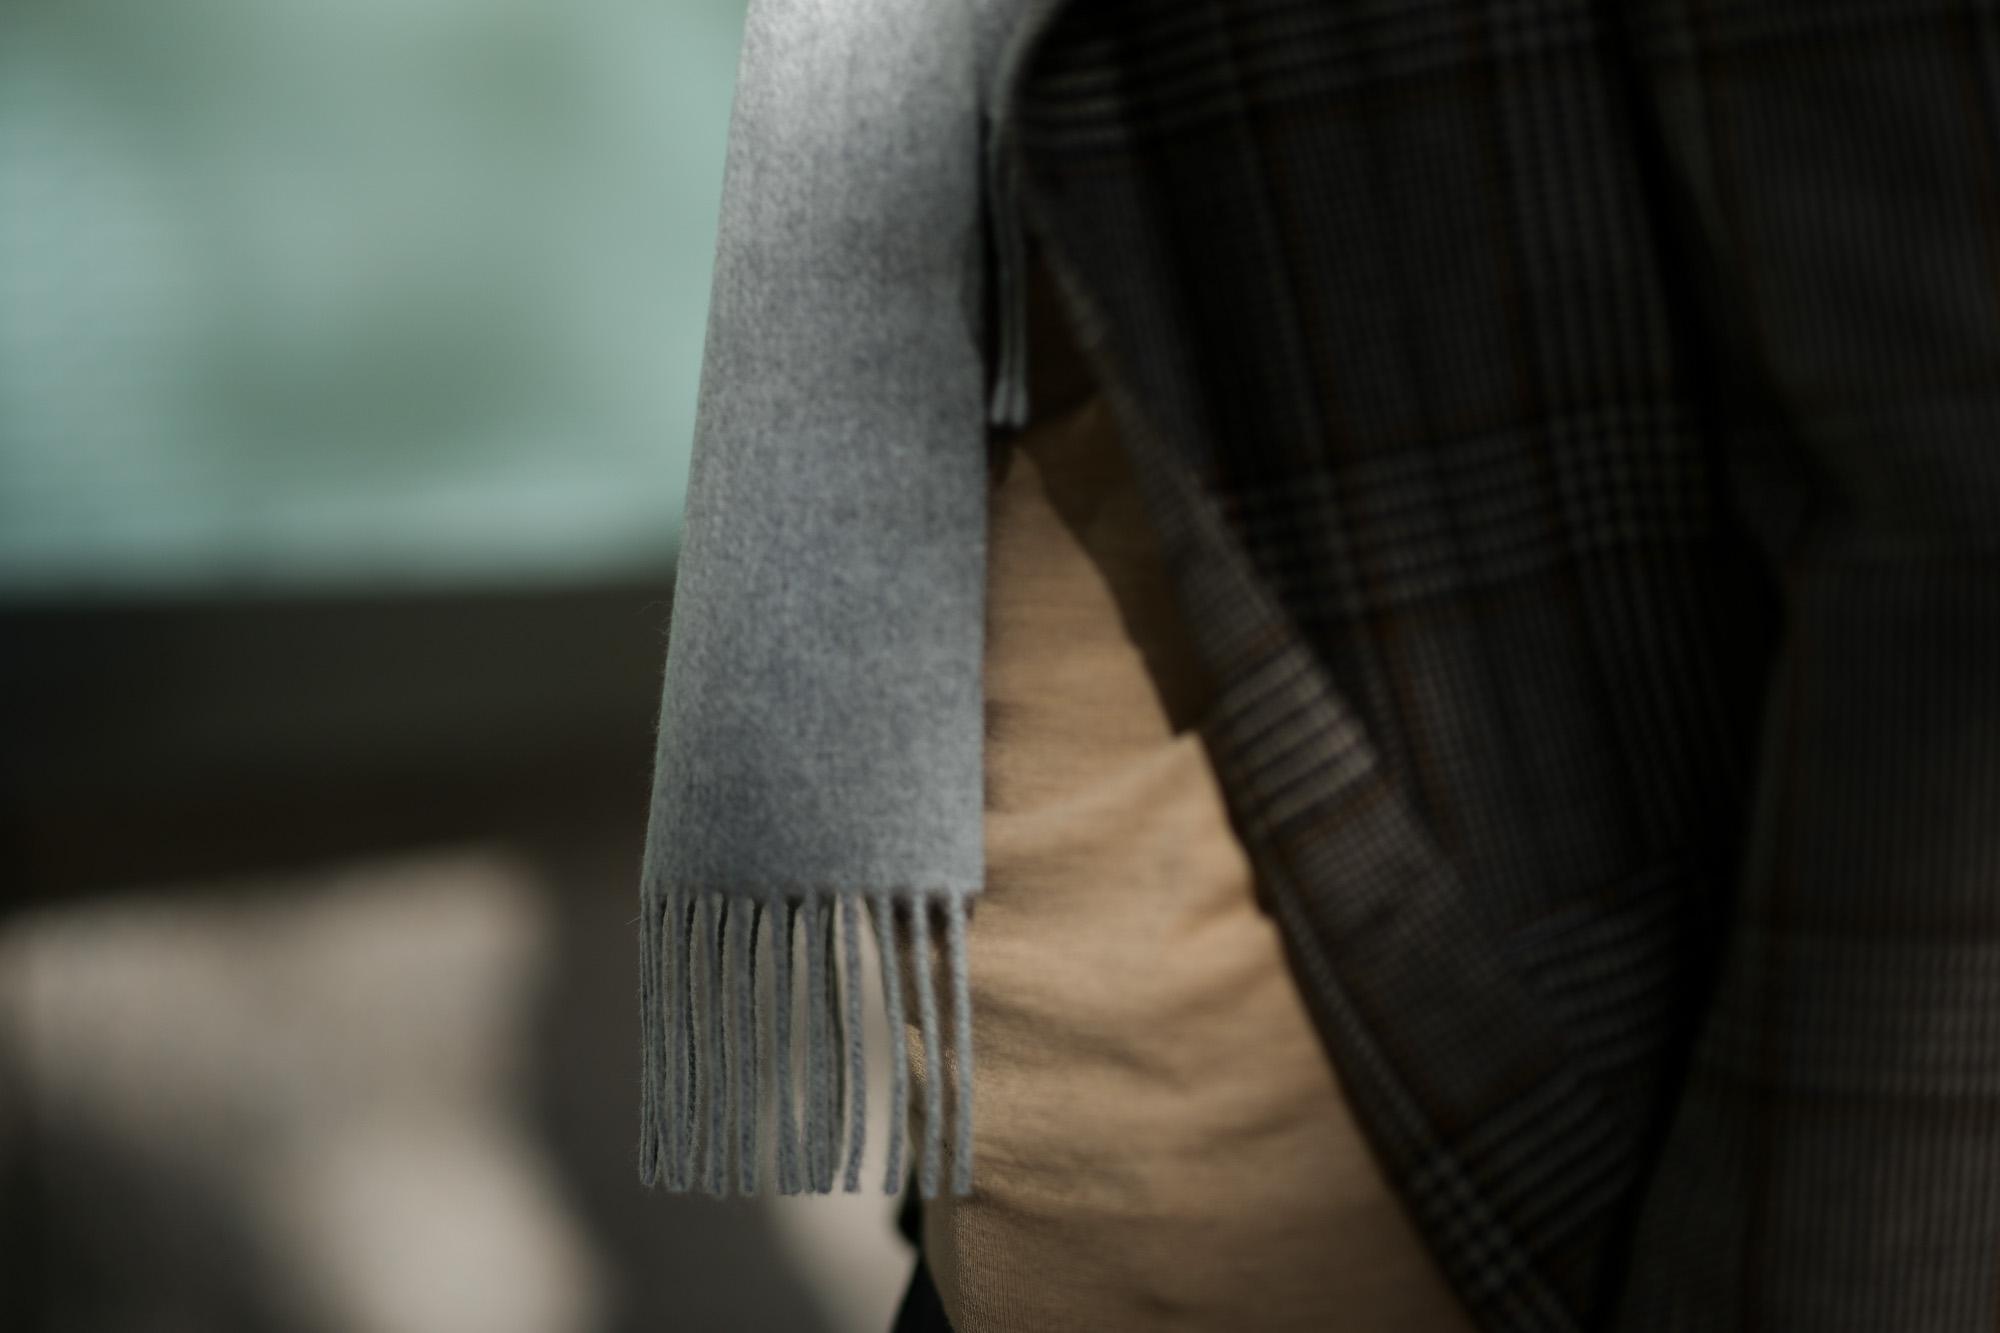 Johnstons (ジョンストンズ) WA16 MUFFLER SCARF Cashmere 100% カシミア マフラー Light Grey (ライトグレー・HA0200) Made in Scotland (スコットランド製) 2018 秋冬新作 愛知 名古屋 alto e diritto altoediritto アルトエデリット ストール ジョンストンズ